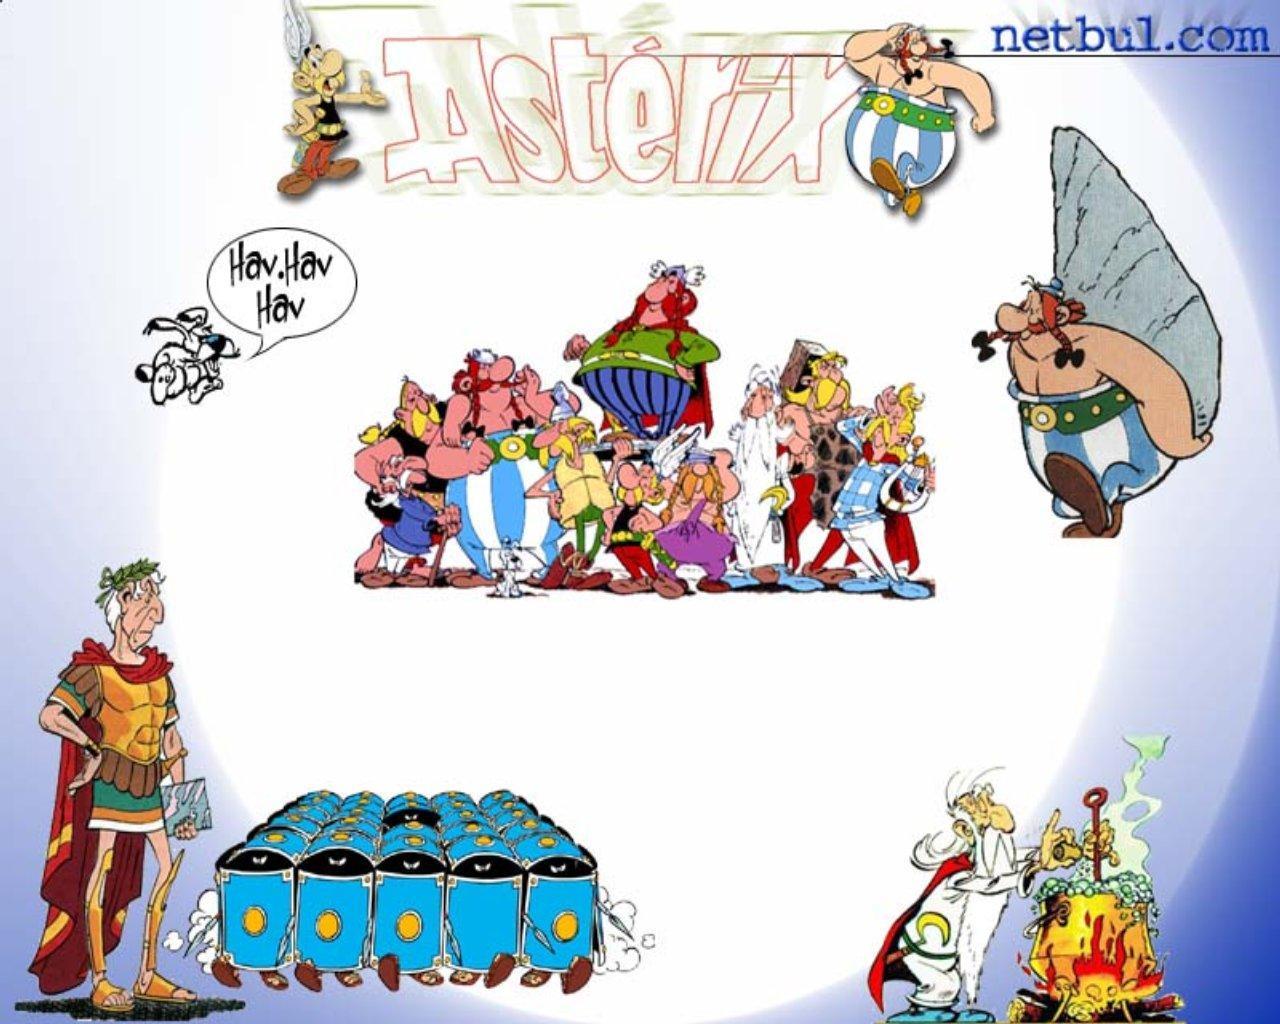 asterix code